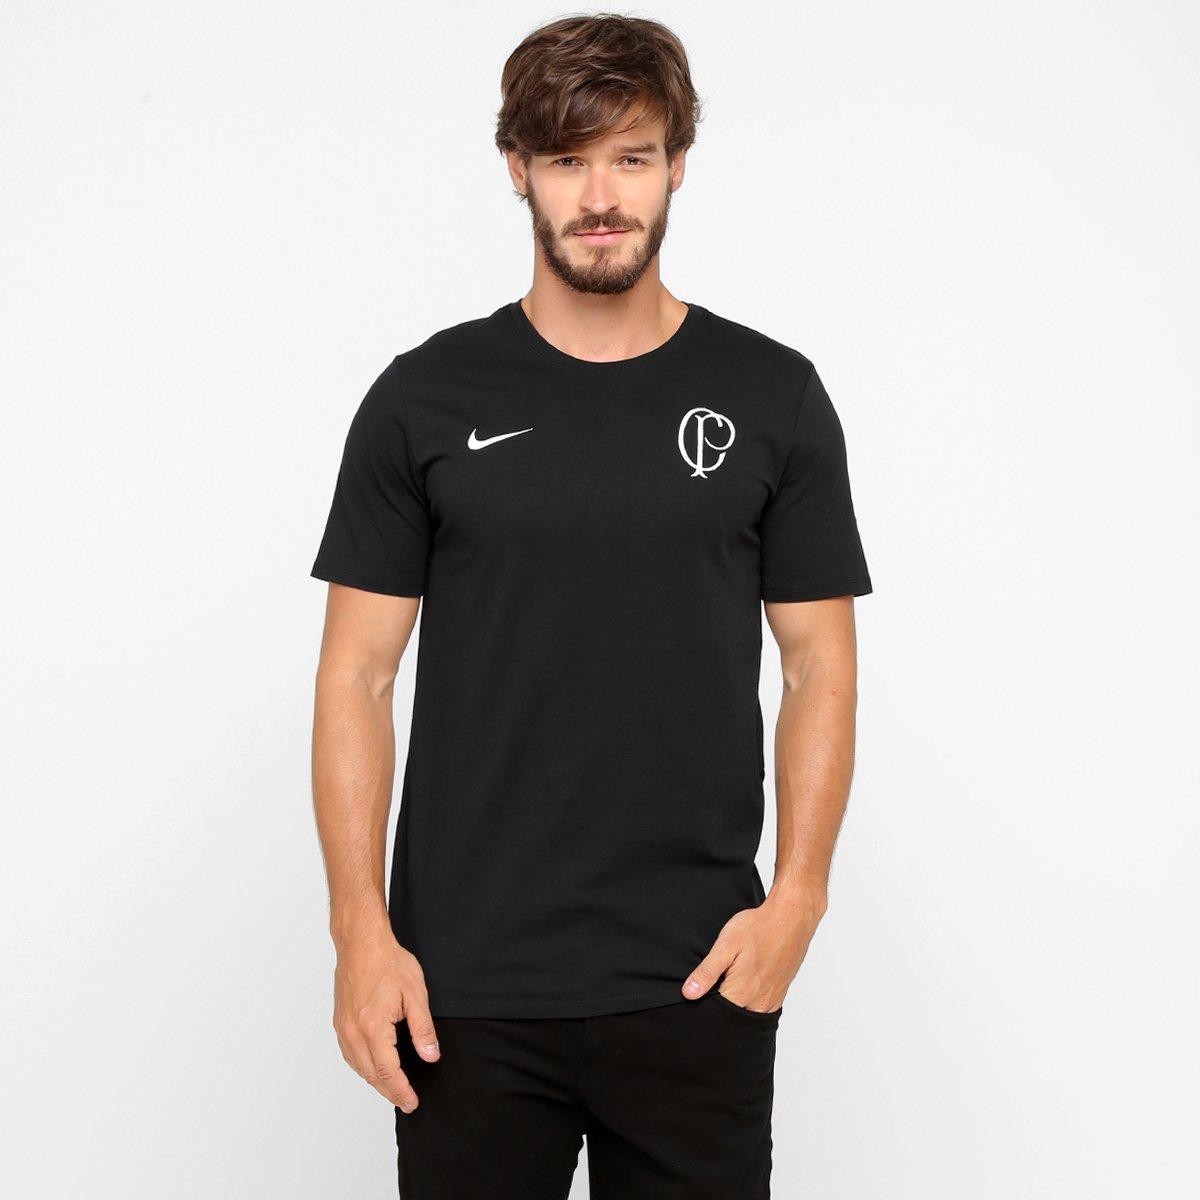 2469fd09ef629 Camiseta Nike Corinthians Life Style - Compre Agora